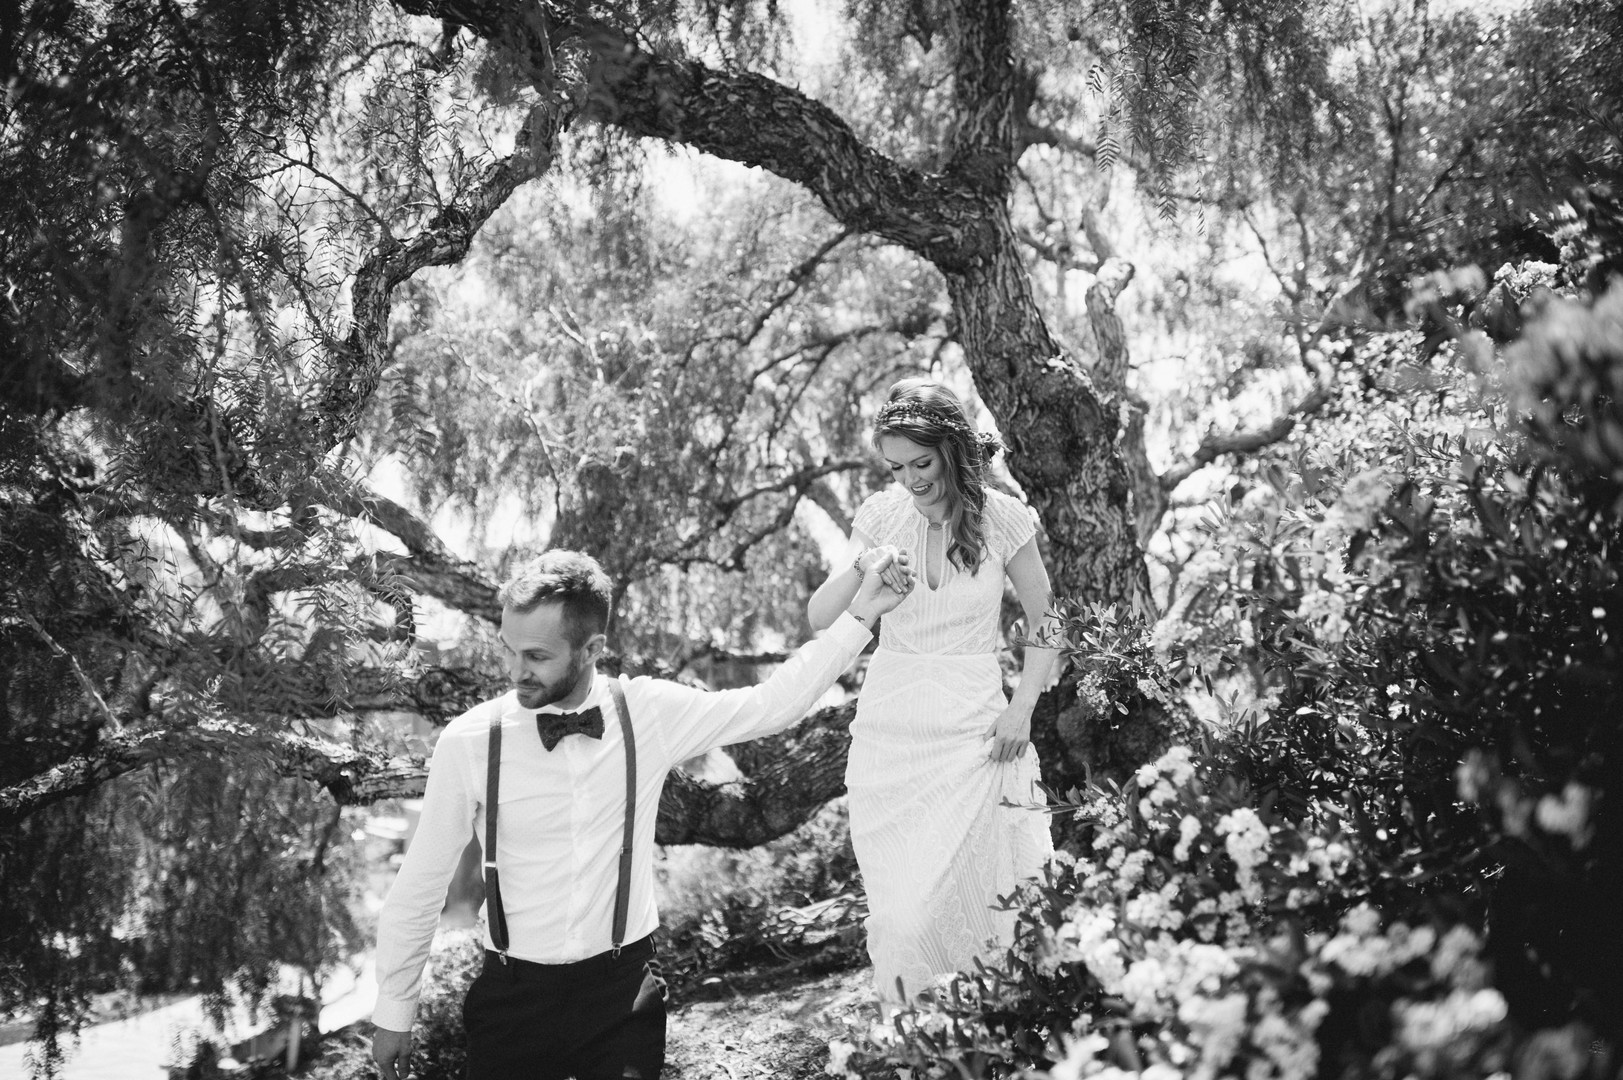 www.santabarbarawedding.com | Sarah Katherine Davis Photography | Santa Barbara Museum of Natural History | Wild Heart Events | BHLDN | Bride and Groom Among the Trees